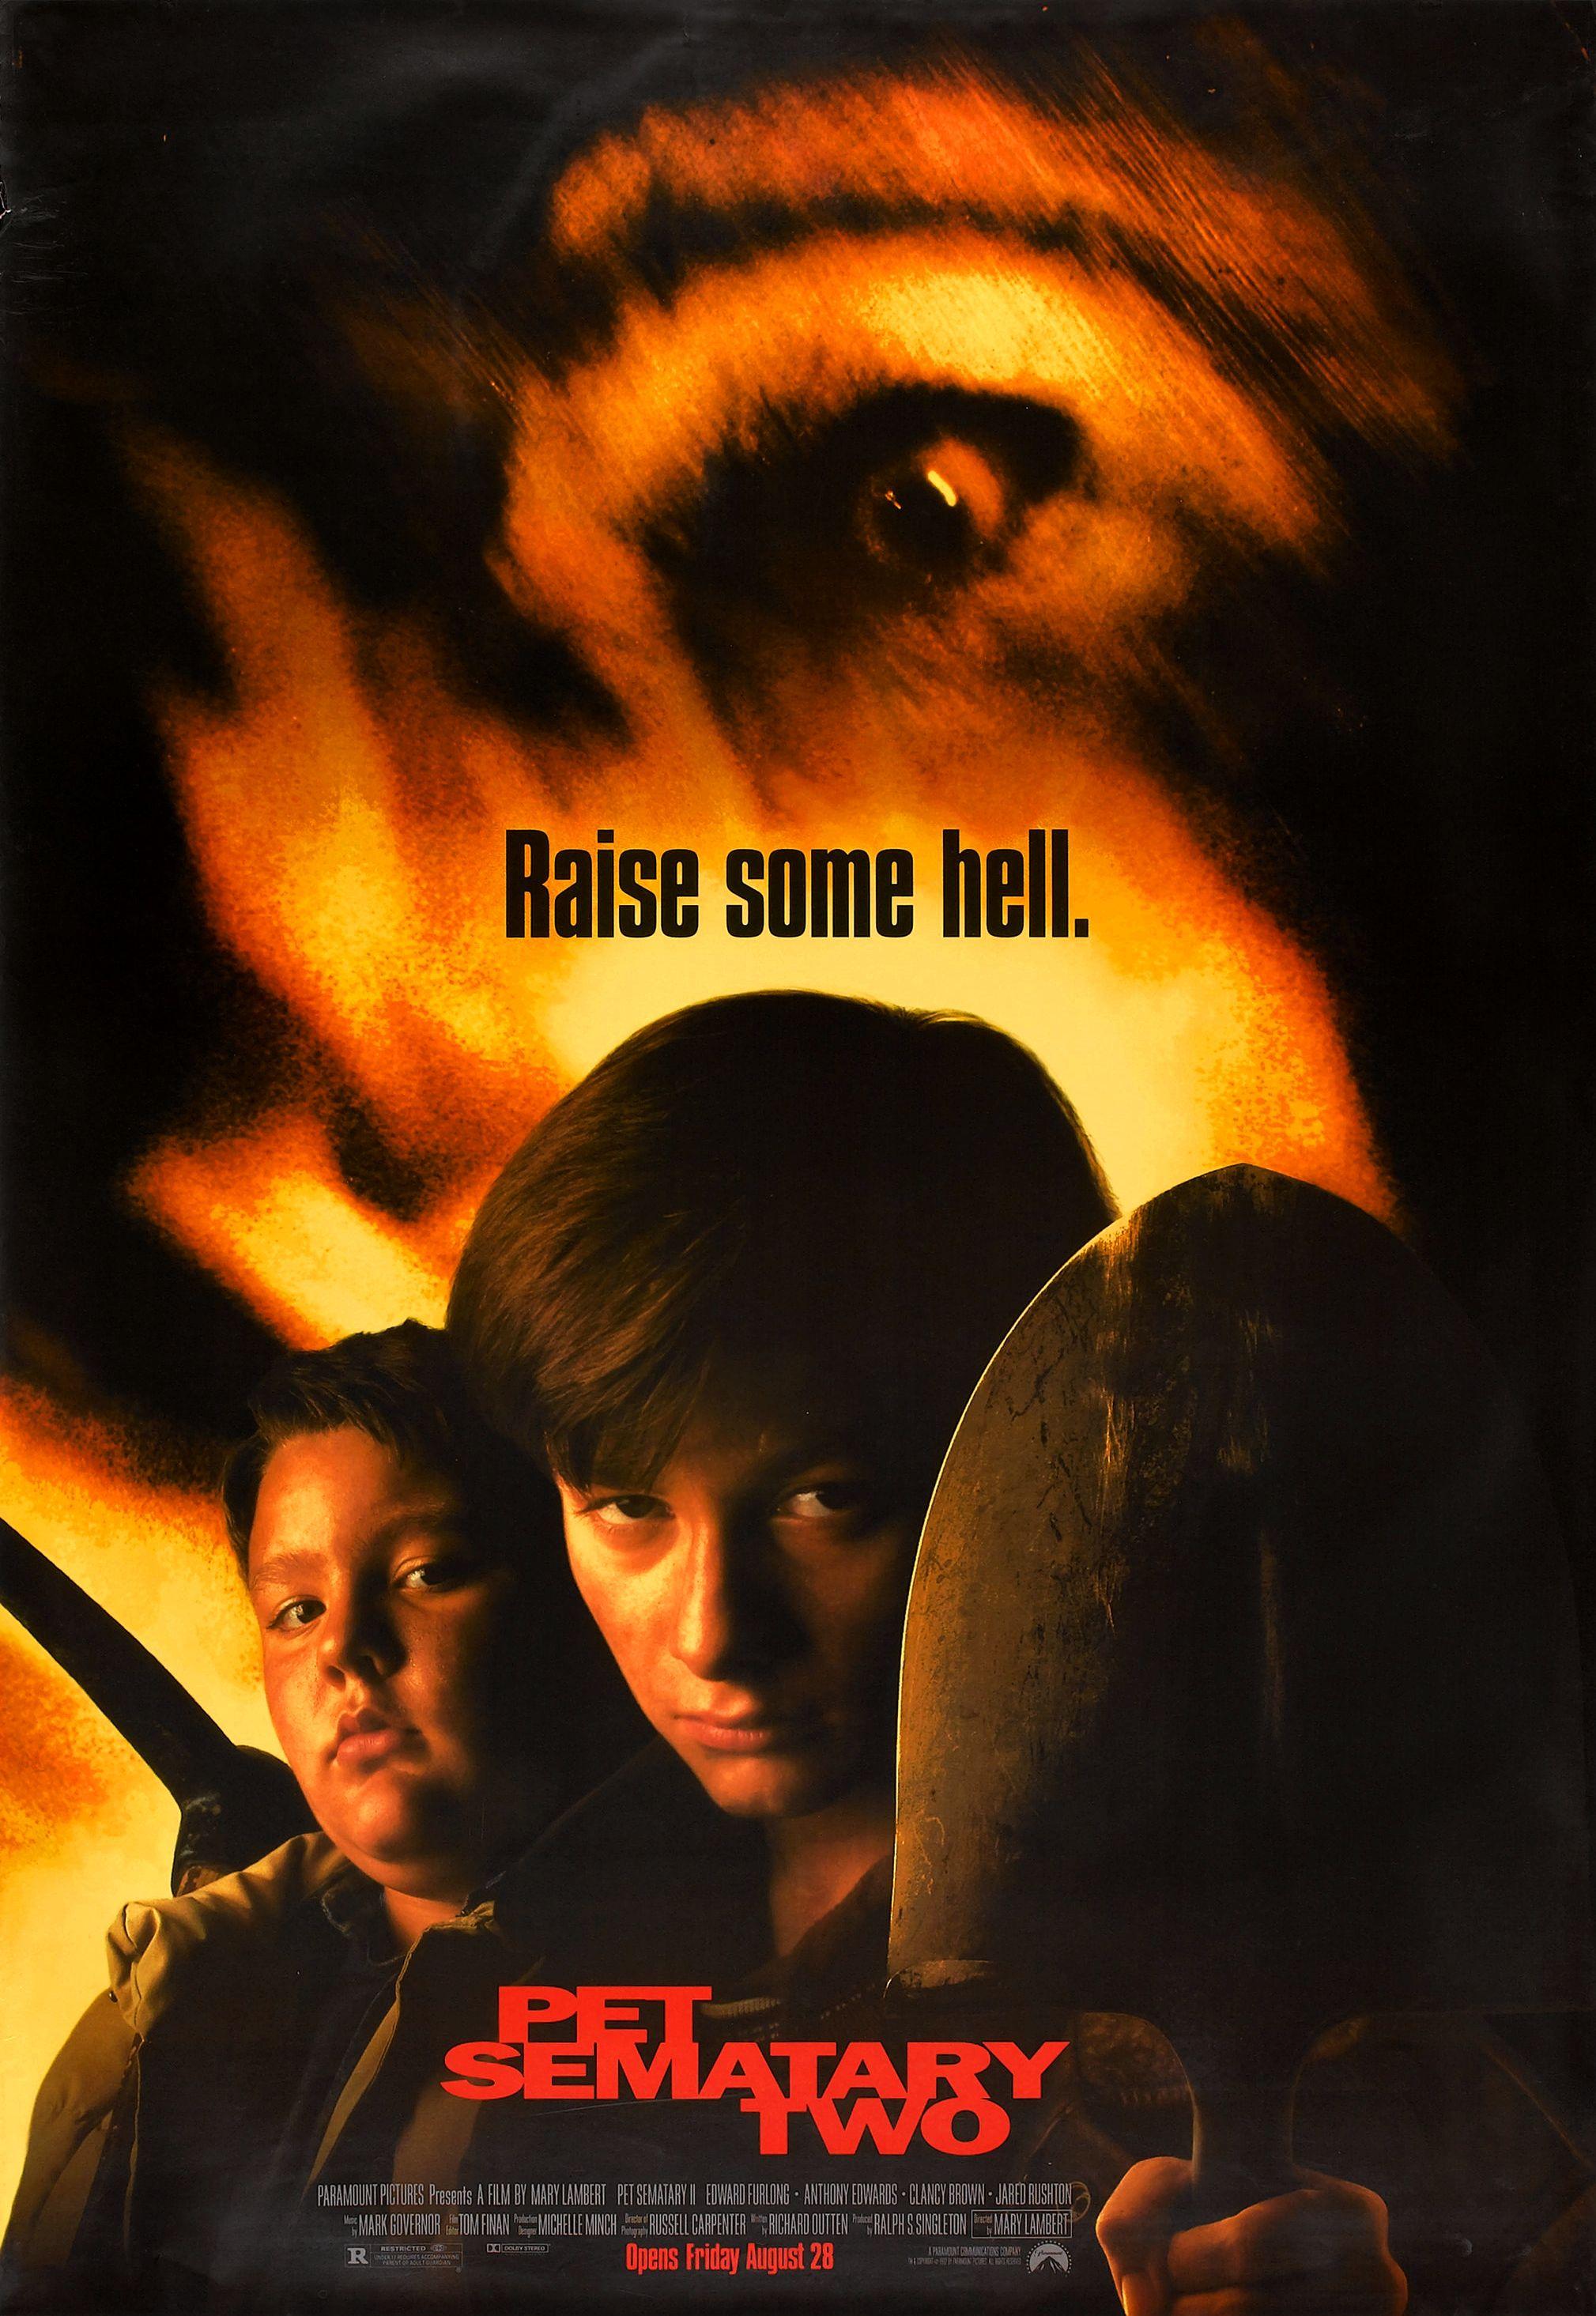 pet sematary ii (1992) imdb